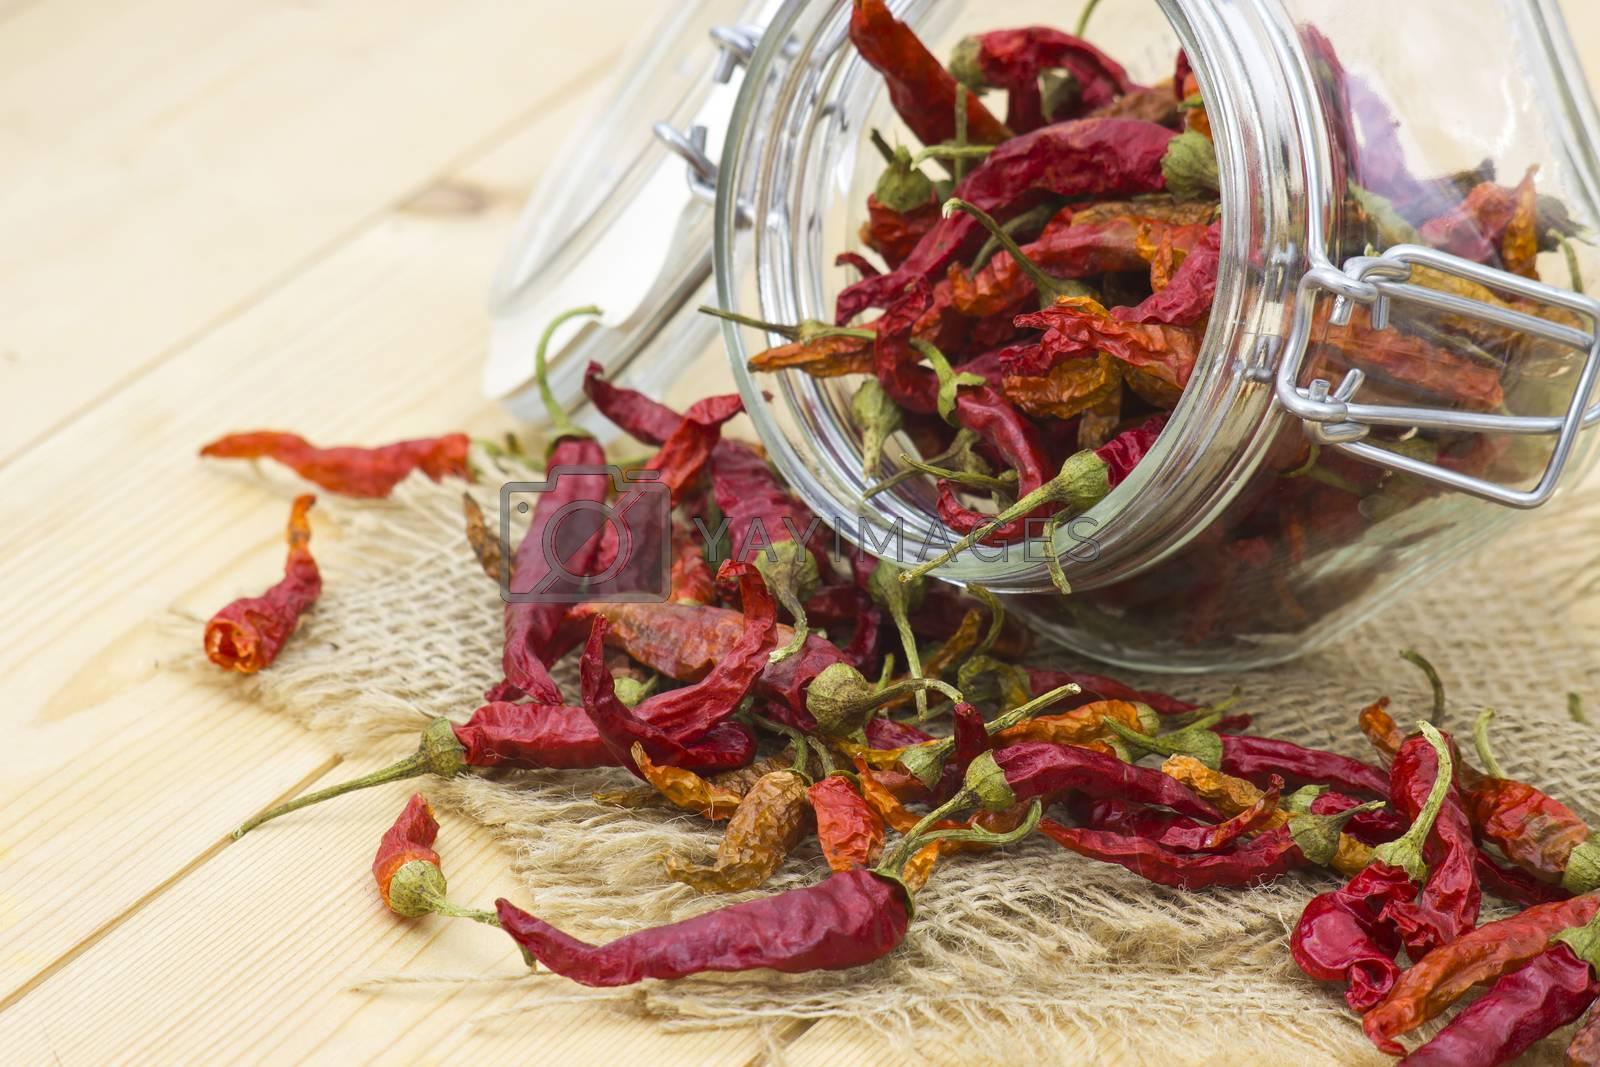 red chot chili peppers by miradrozdowski